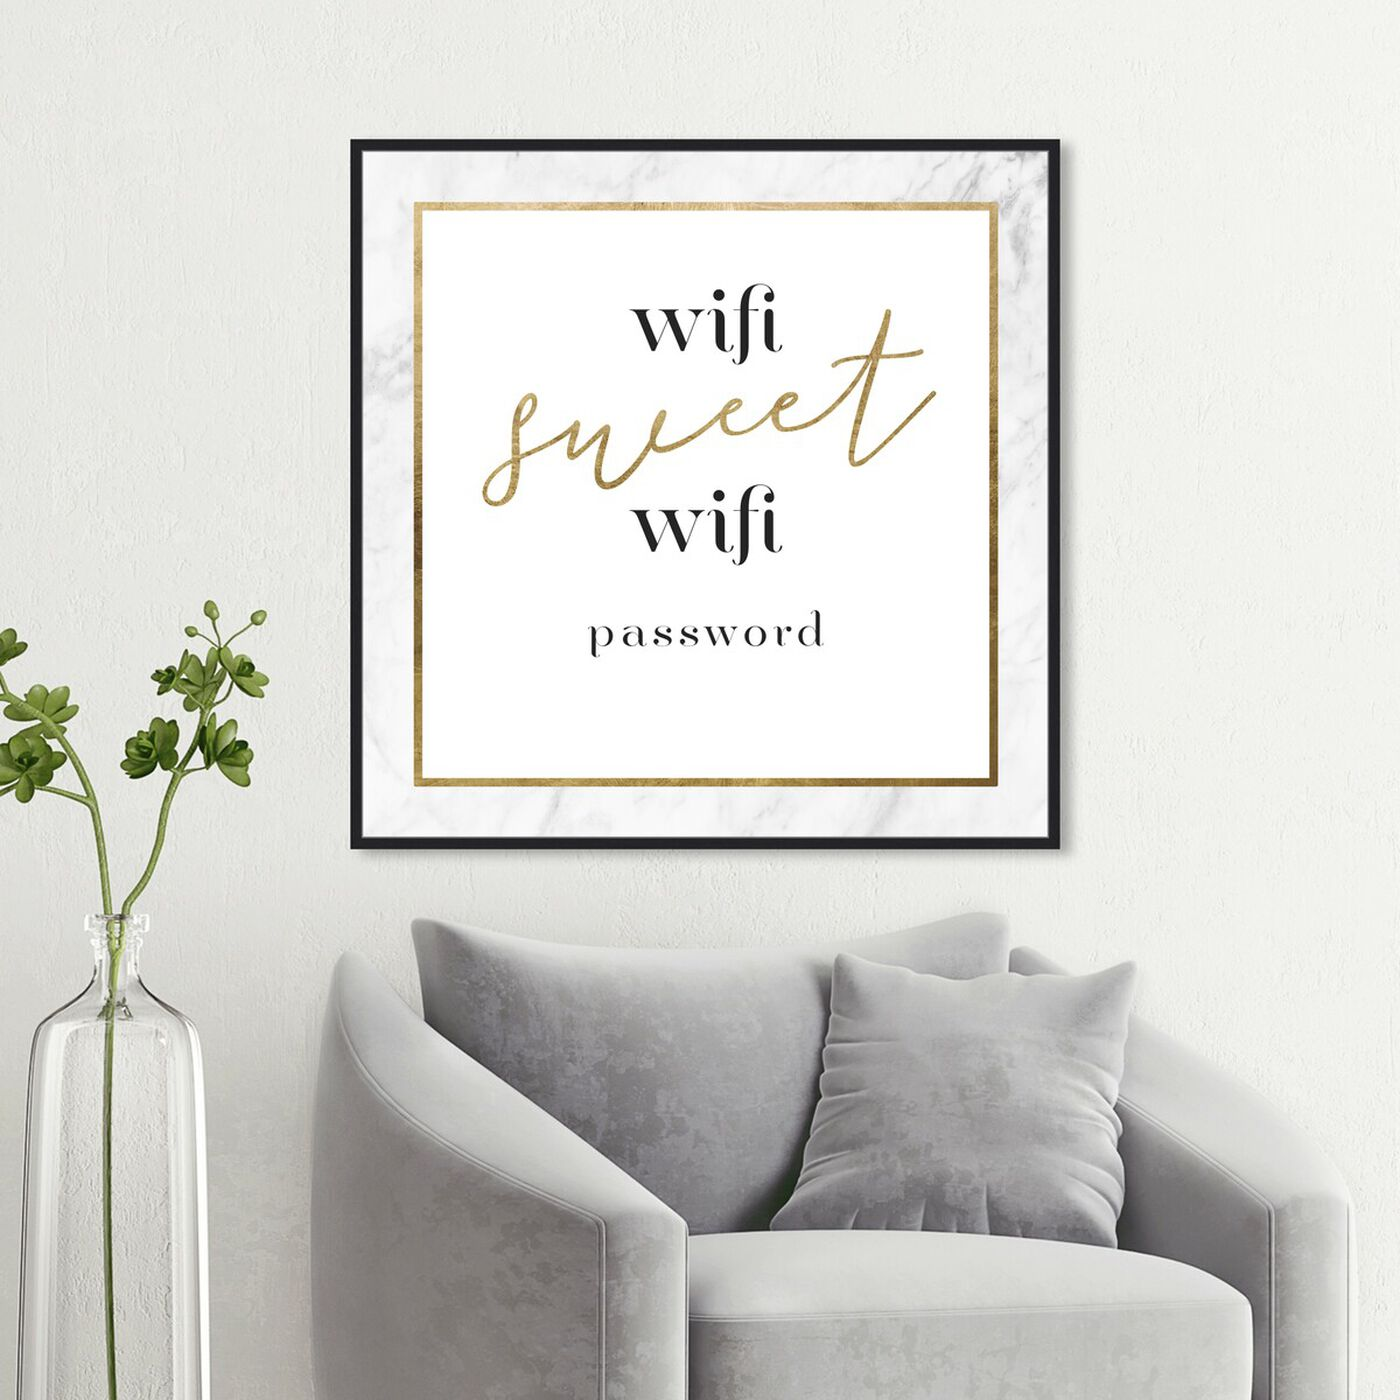 Hanging view of Wifi Sweet Wifi Gold art.